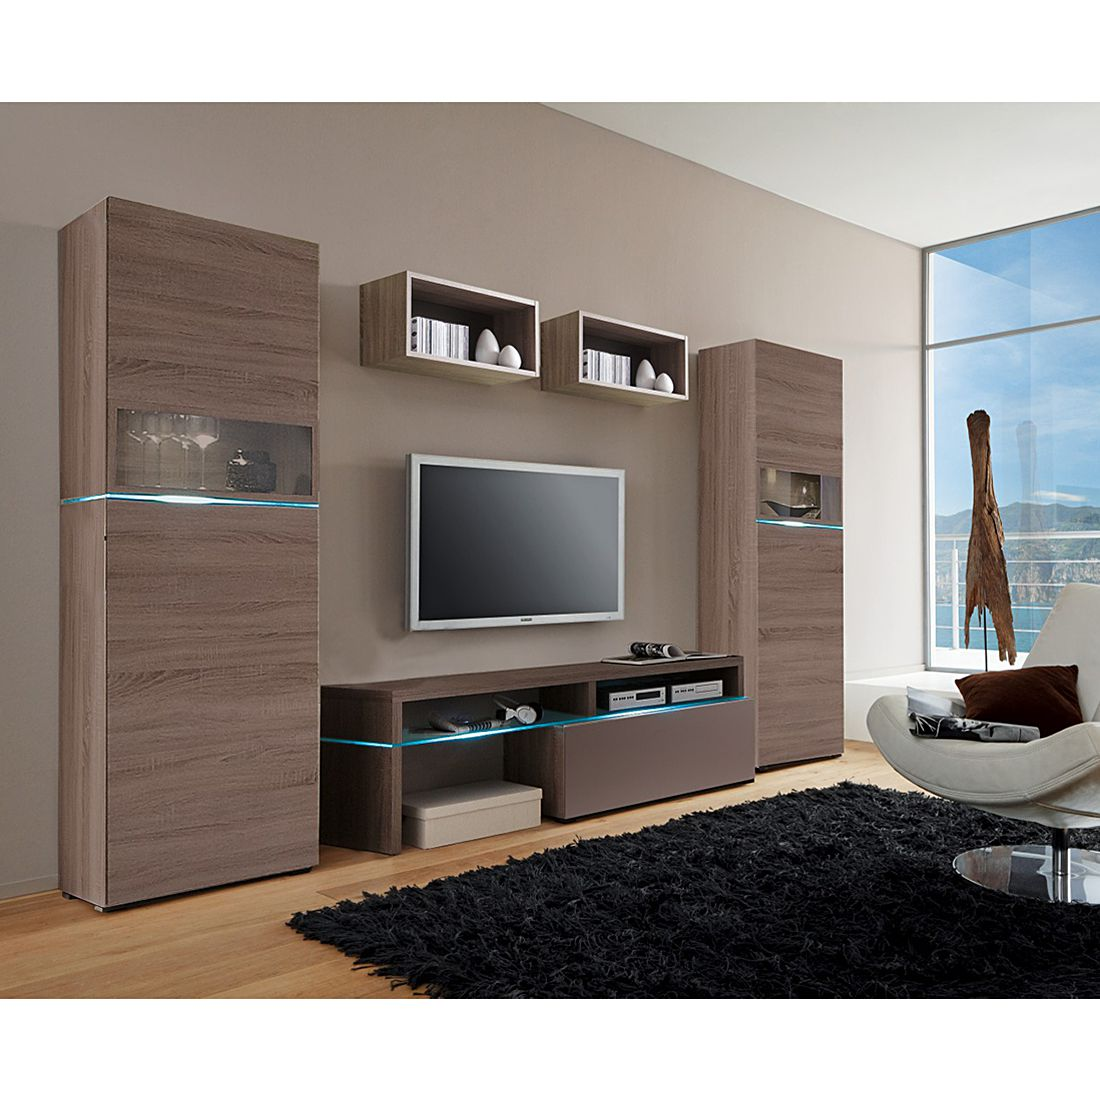 wohnwand beleuchtung mit fernbedienung eek a wohnwand colourart iii wohnwand beleuchtung mit. Black Bedroom Furniture Sets. Home Design Ideas